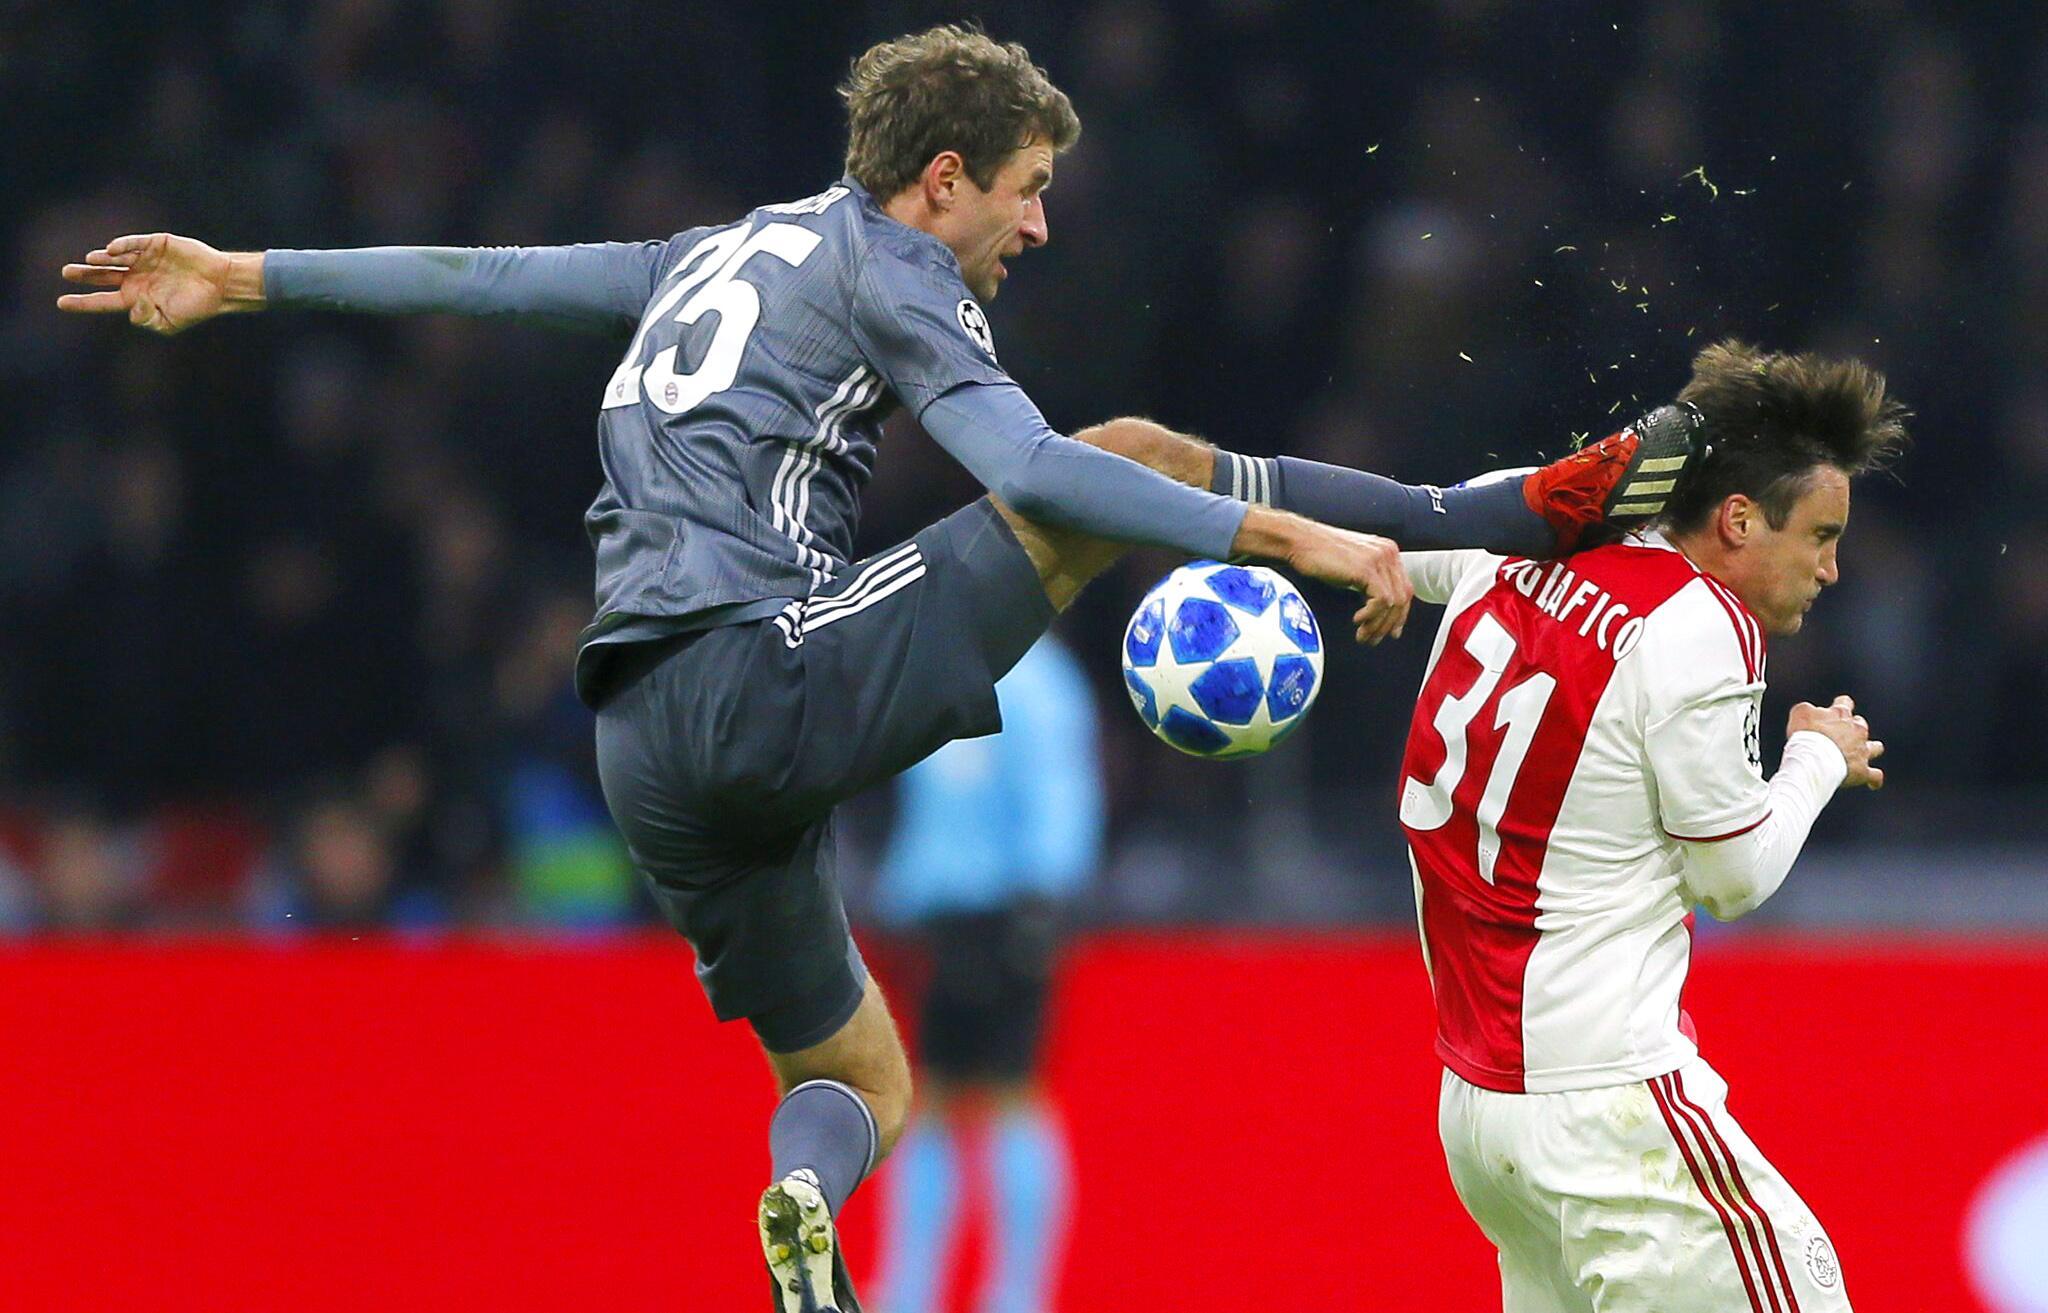 Bild zu Champions League, Ajax Amsterdam - Bayern München, Thomas Müller, Kung Fu, Nicolas Tagliafico